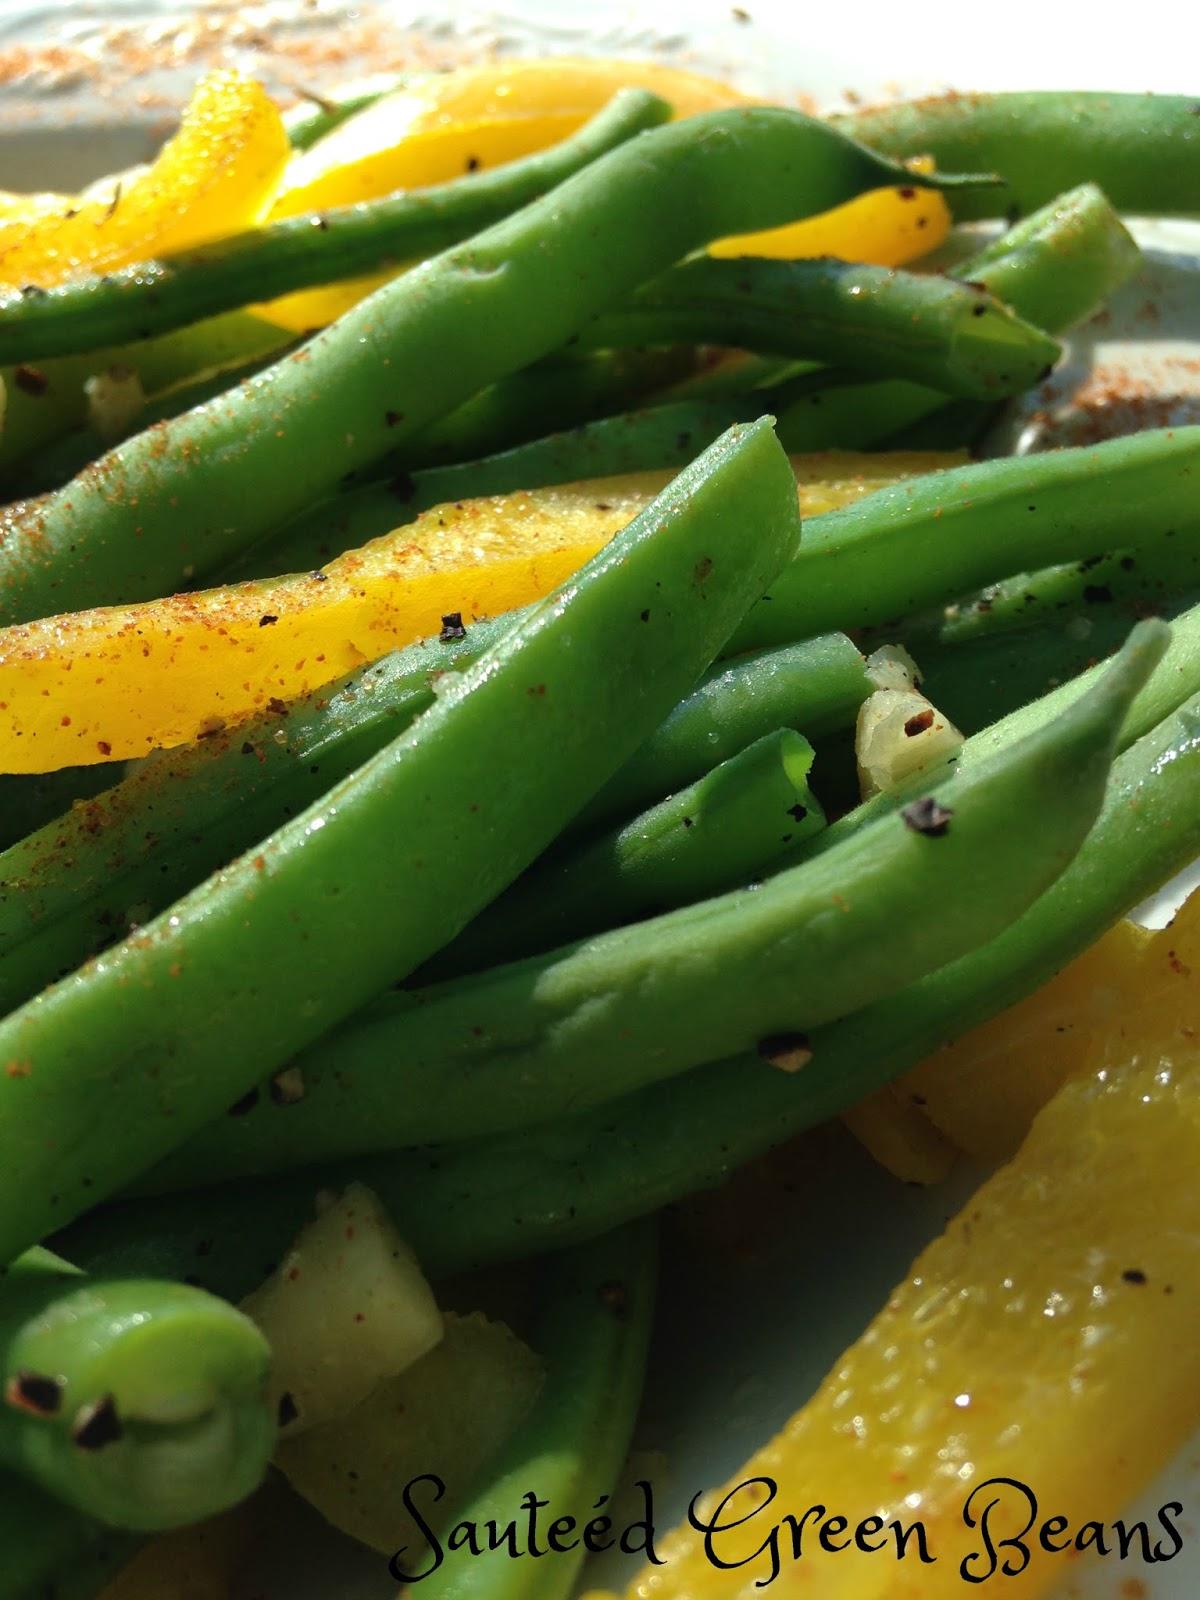 how to cook green beans until crisp-tender